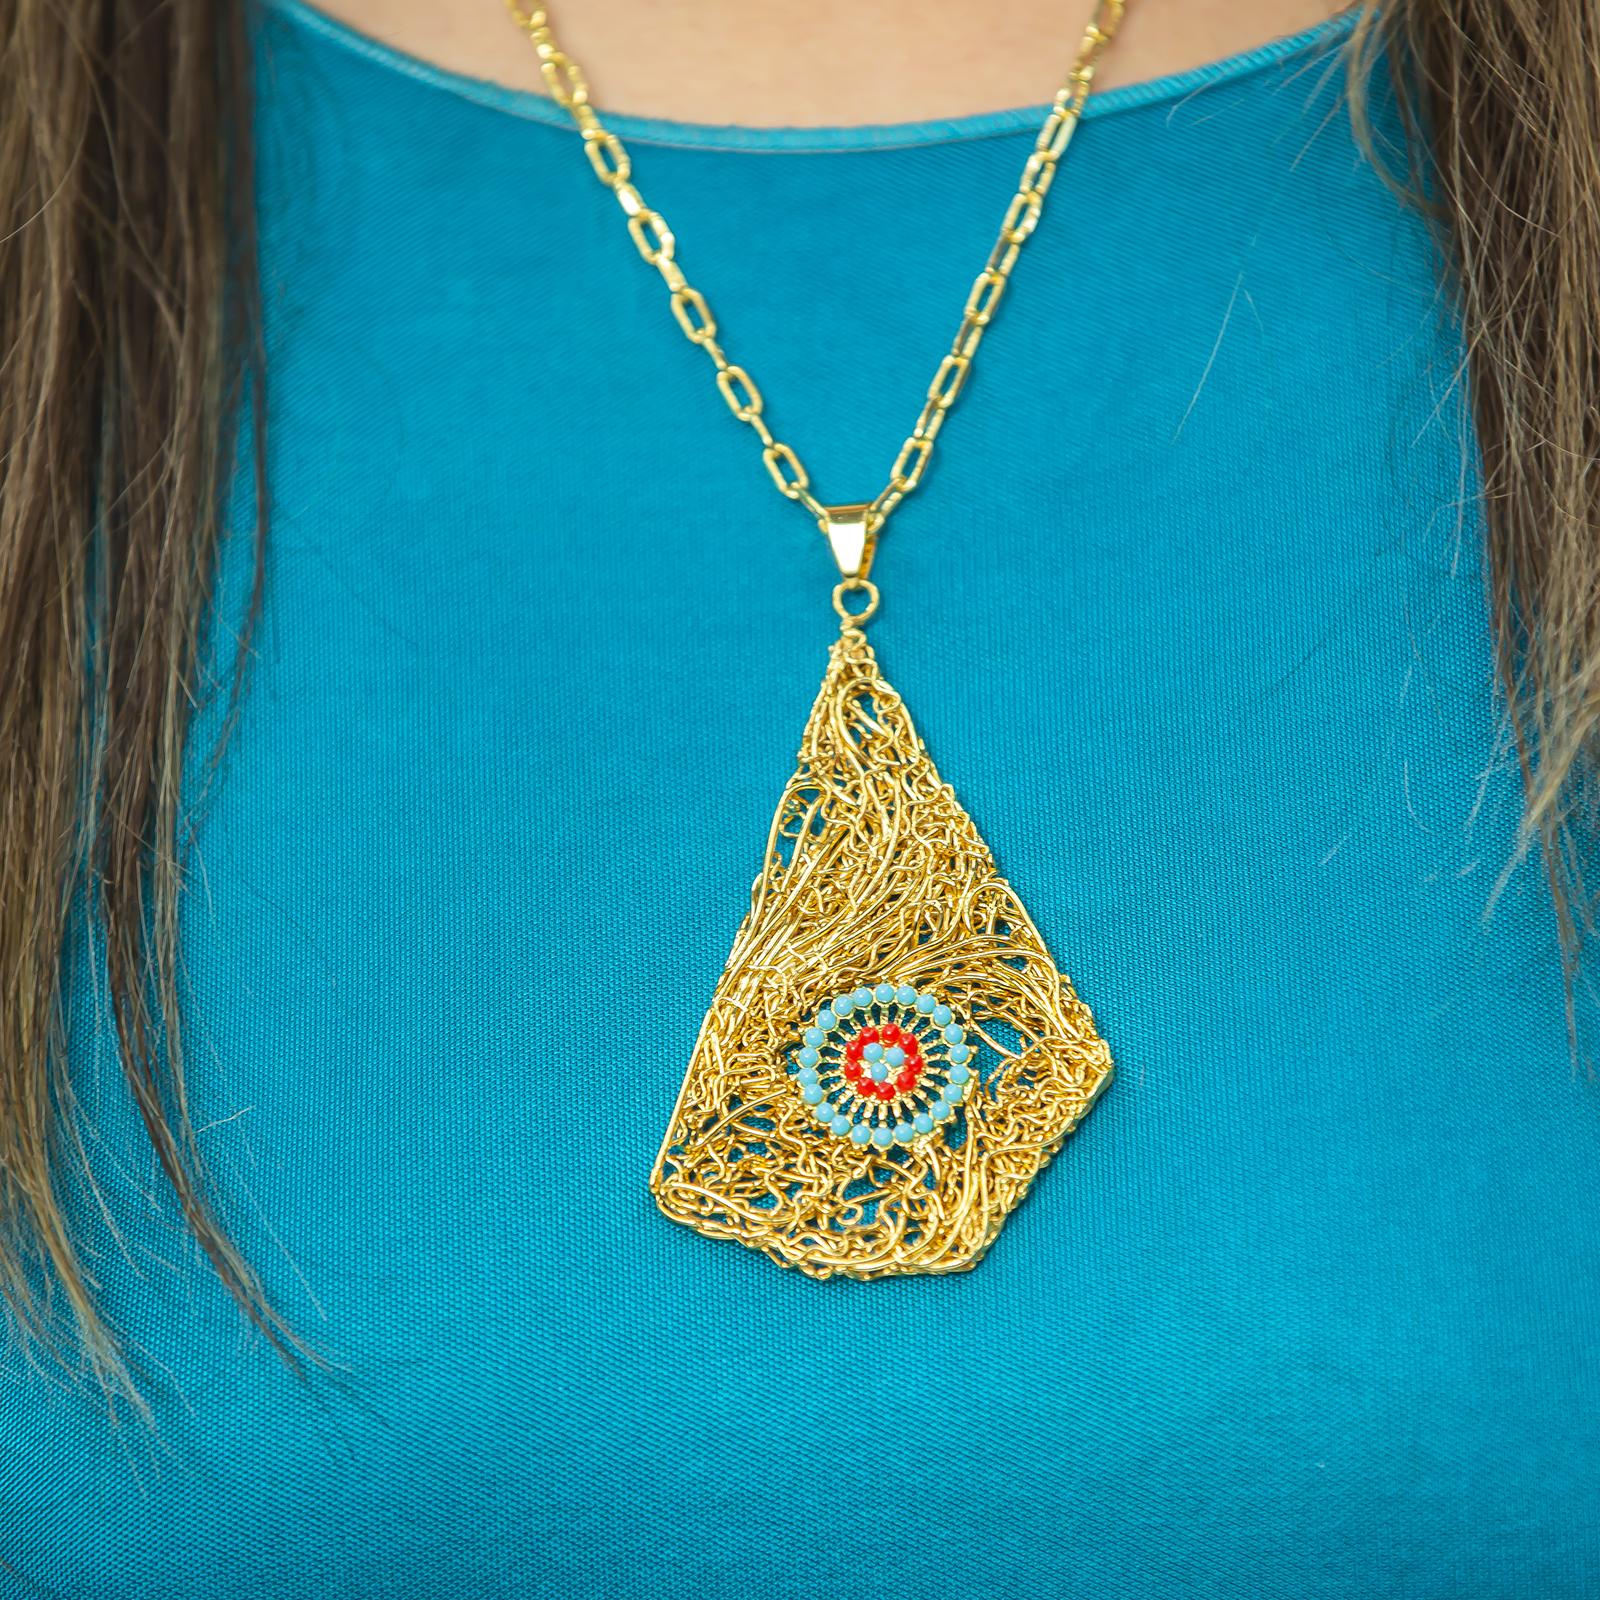 Niu Blau Flowers Necklace